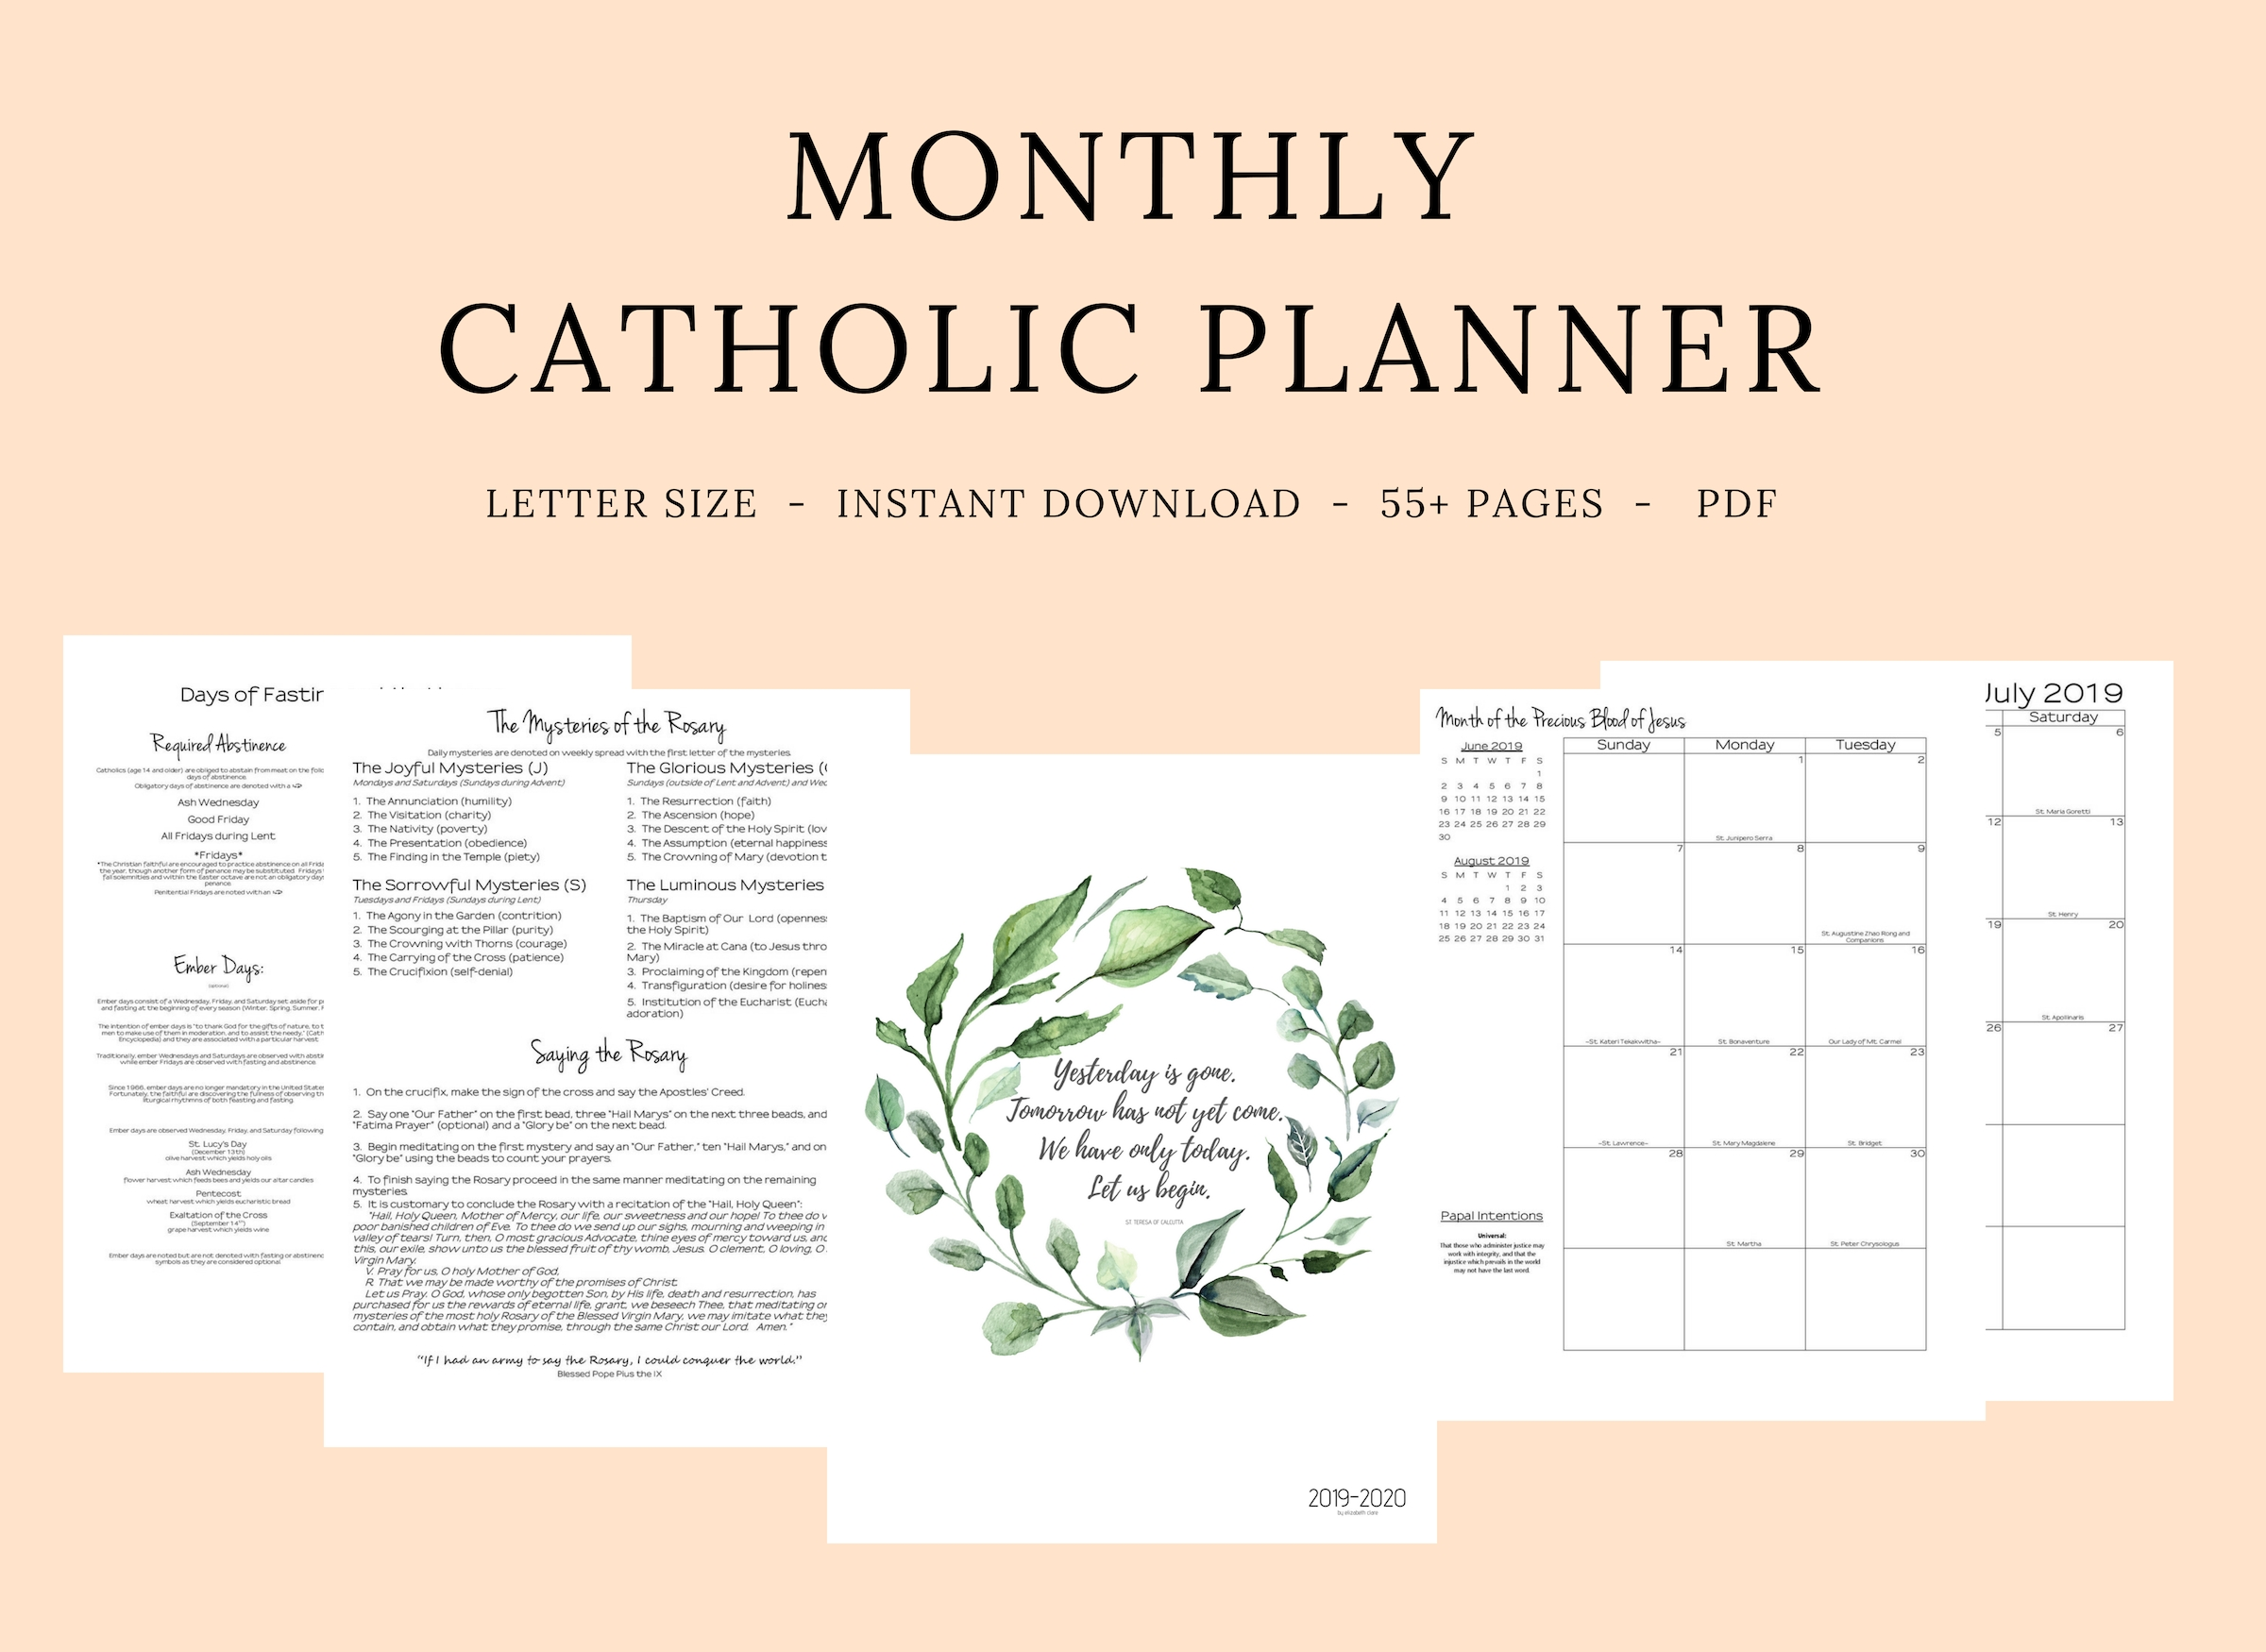 2019- 2020 Catholic Monthly Planner - Elizabeth Clare pertaining to Catholic Liturgical Calendar 2020 Pdf